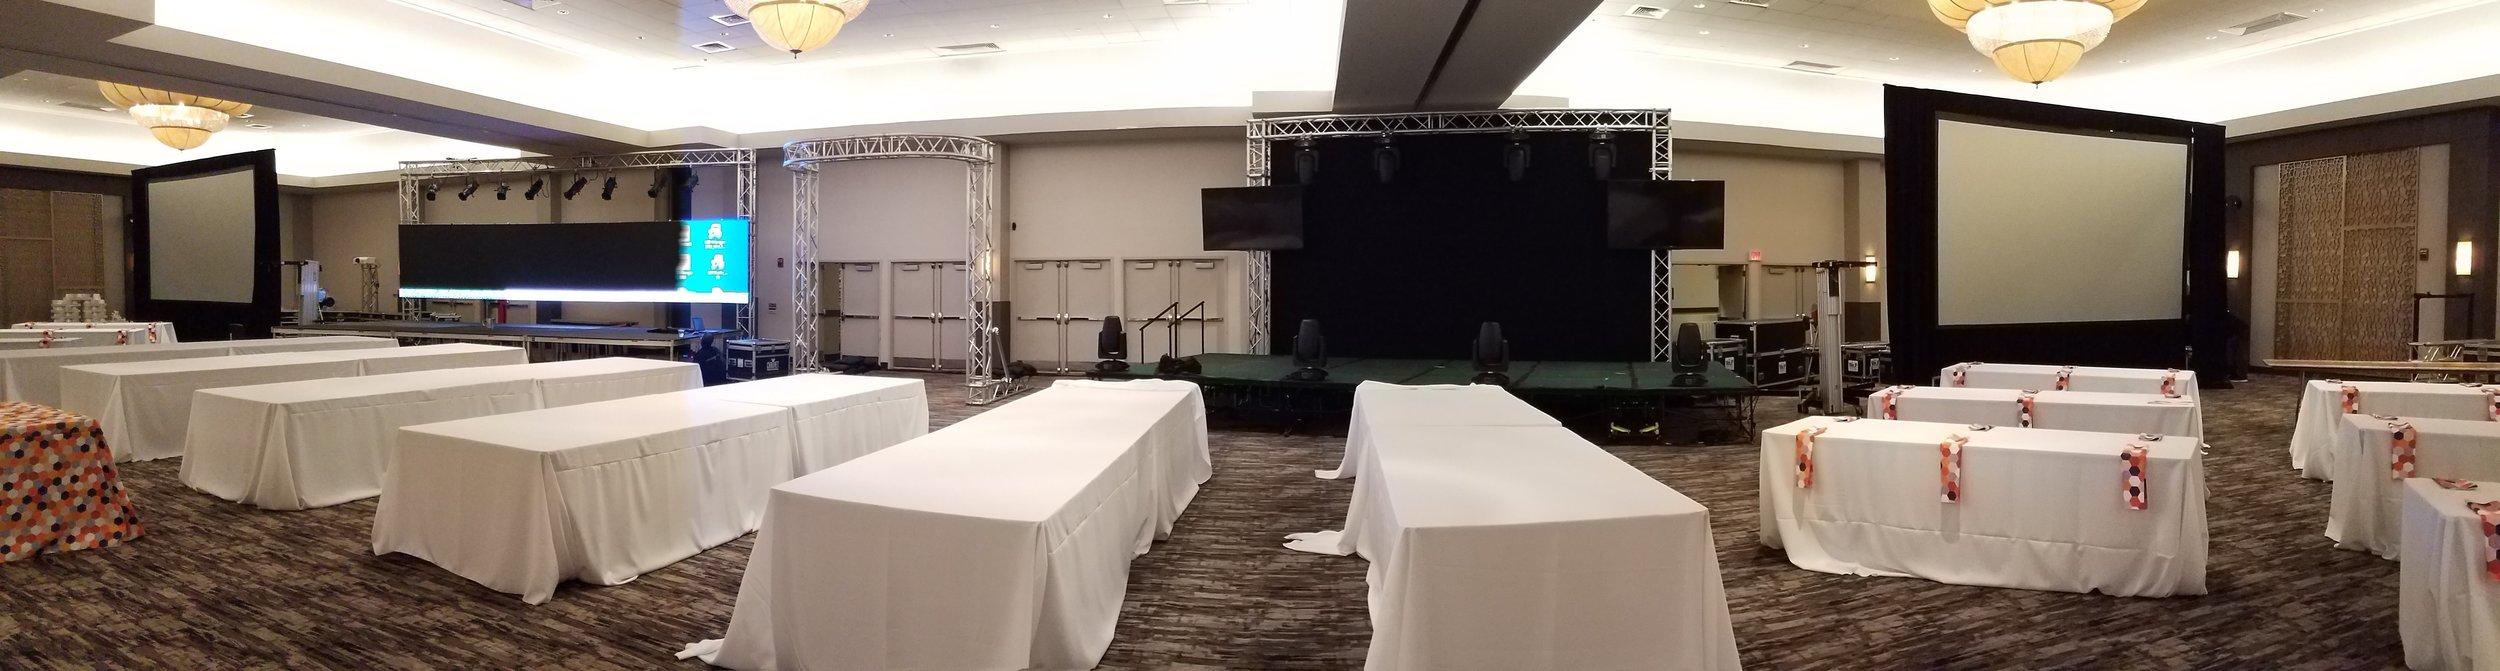 Projector Screens and Presentations